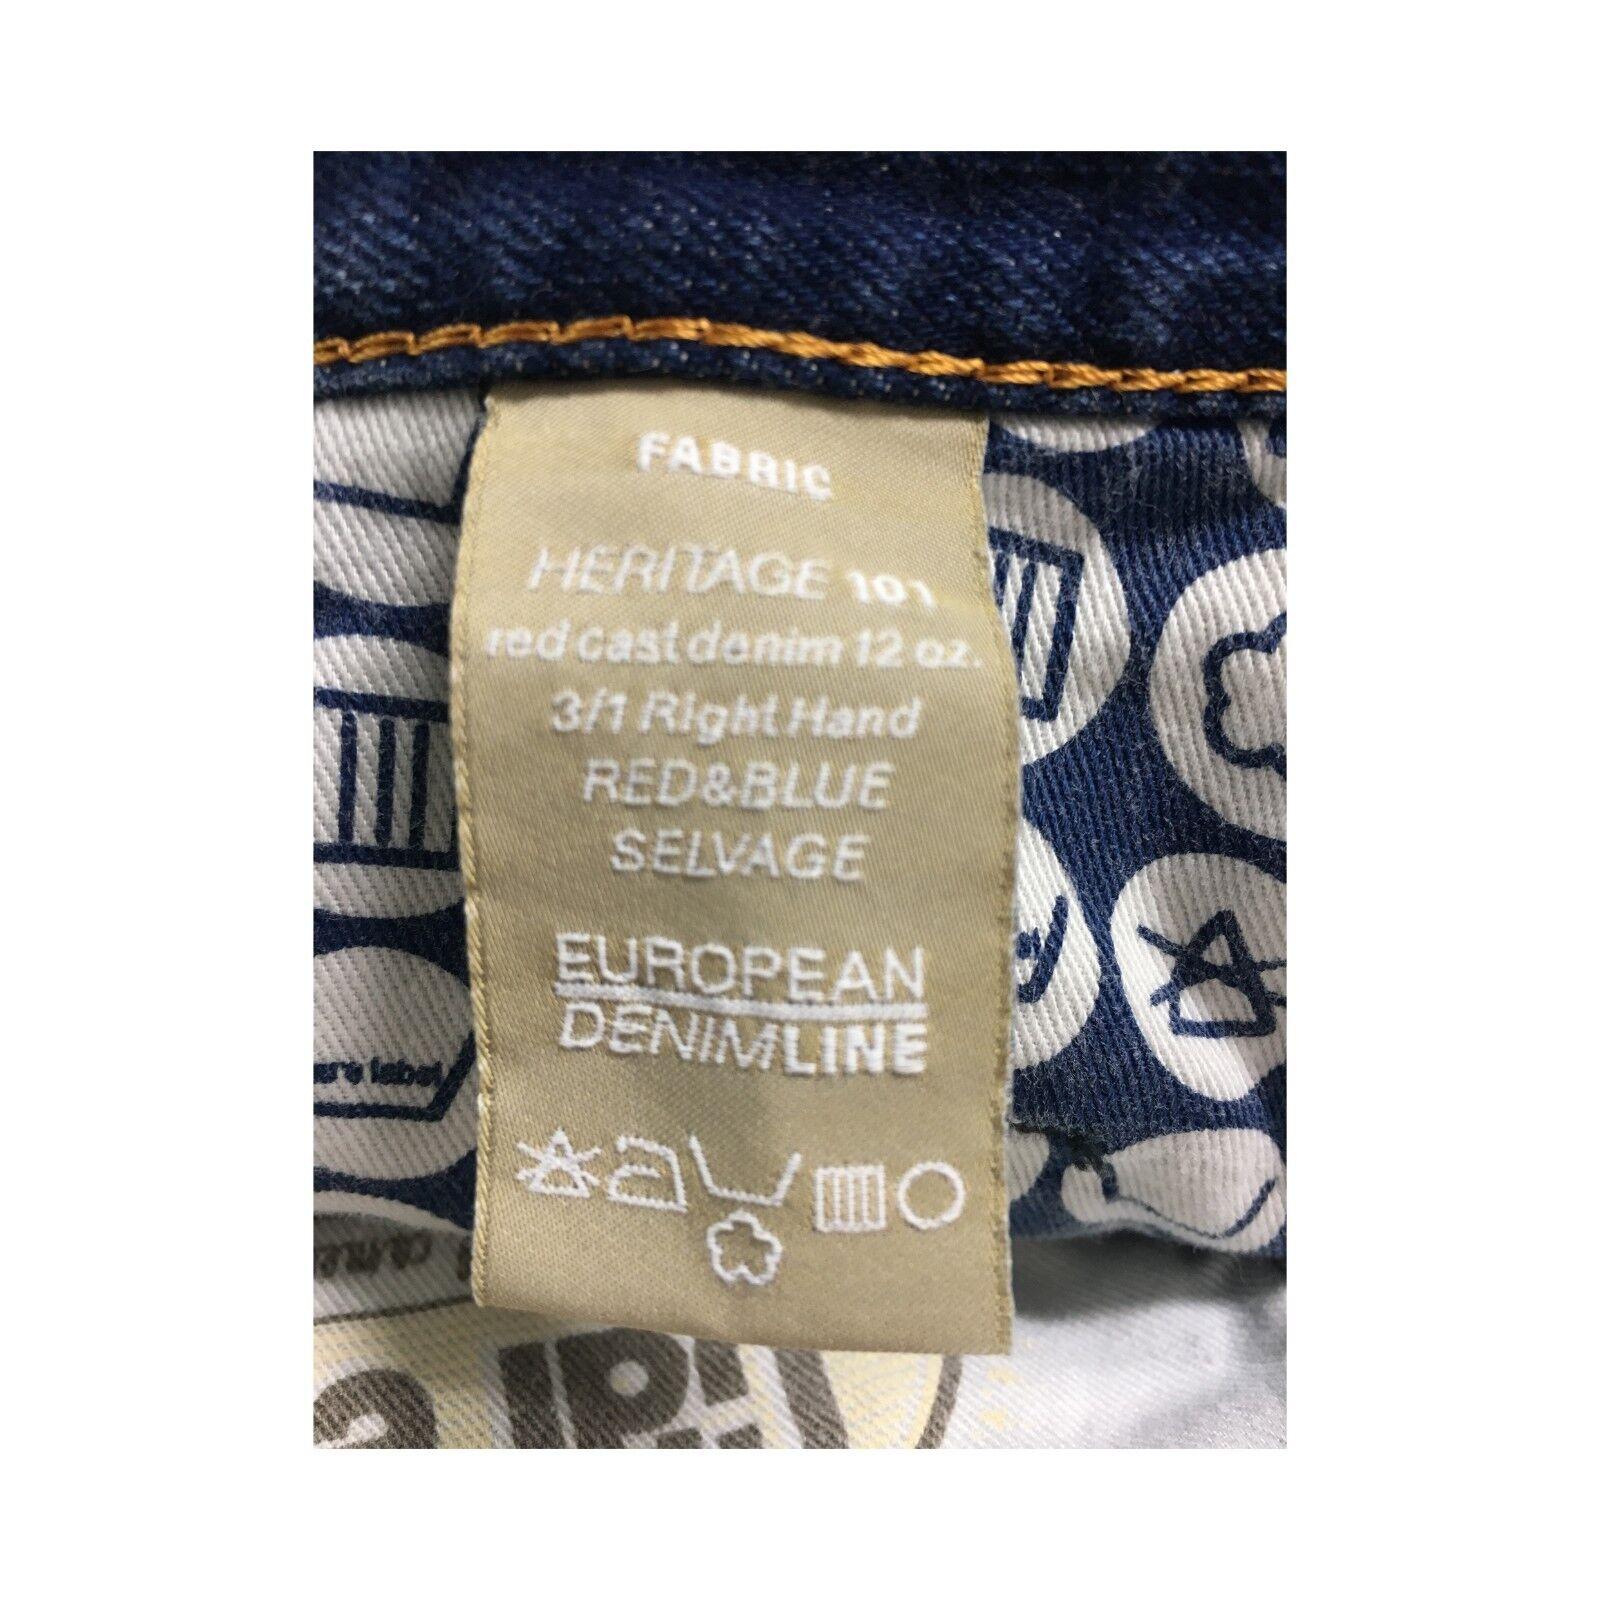 CARE LABEL jeans mod 402 HERITAGE 12 oz BLEU BLEU BLEU LINE 100% coton MADE IN ITALY 5f908c